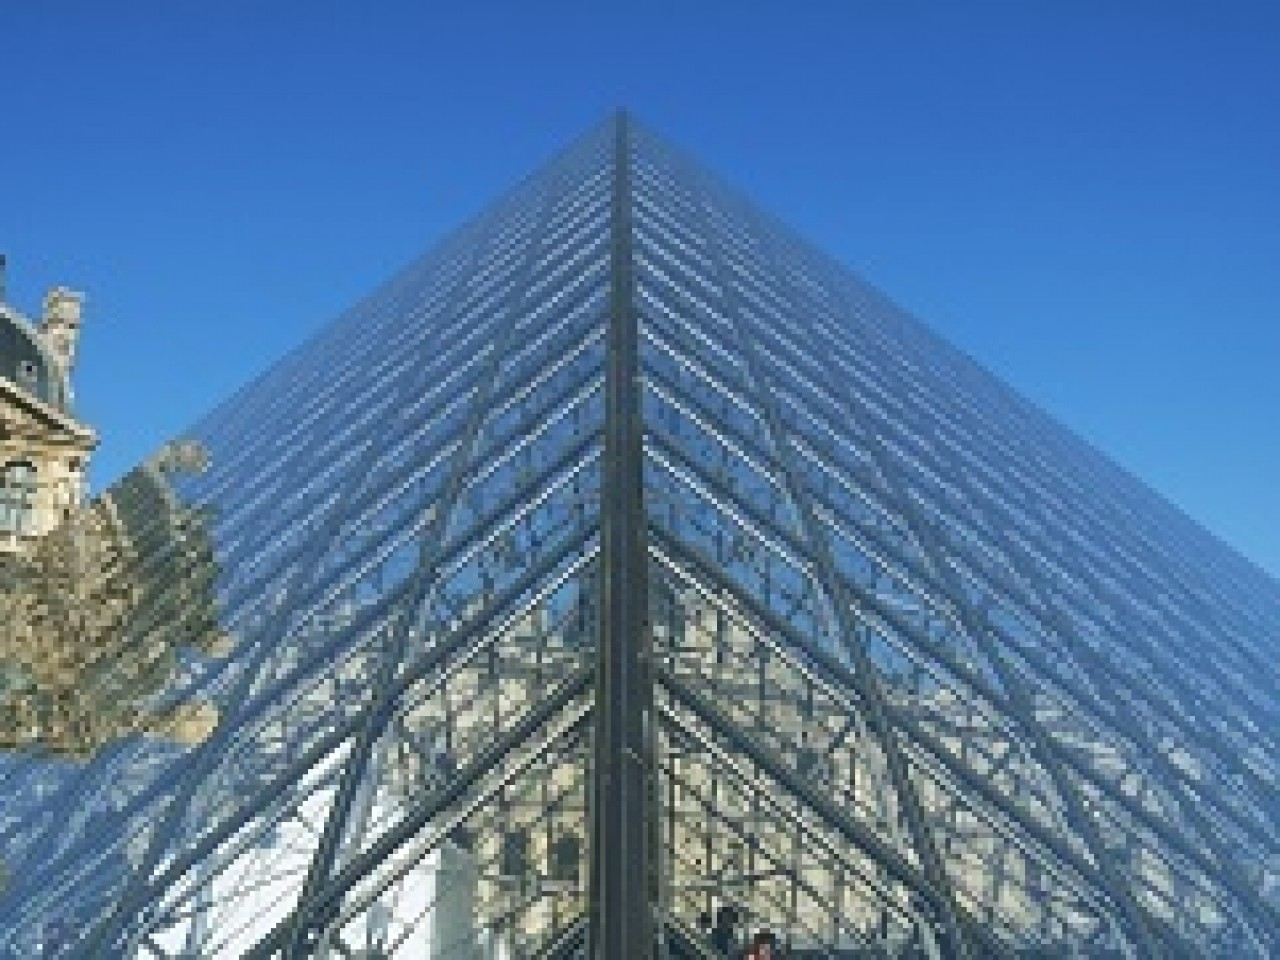 Art & Culture in Paris, 19 September 2021